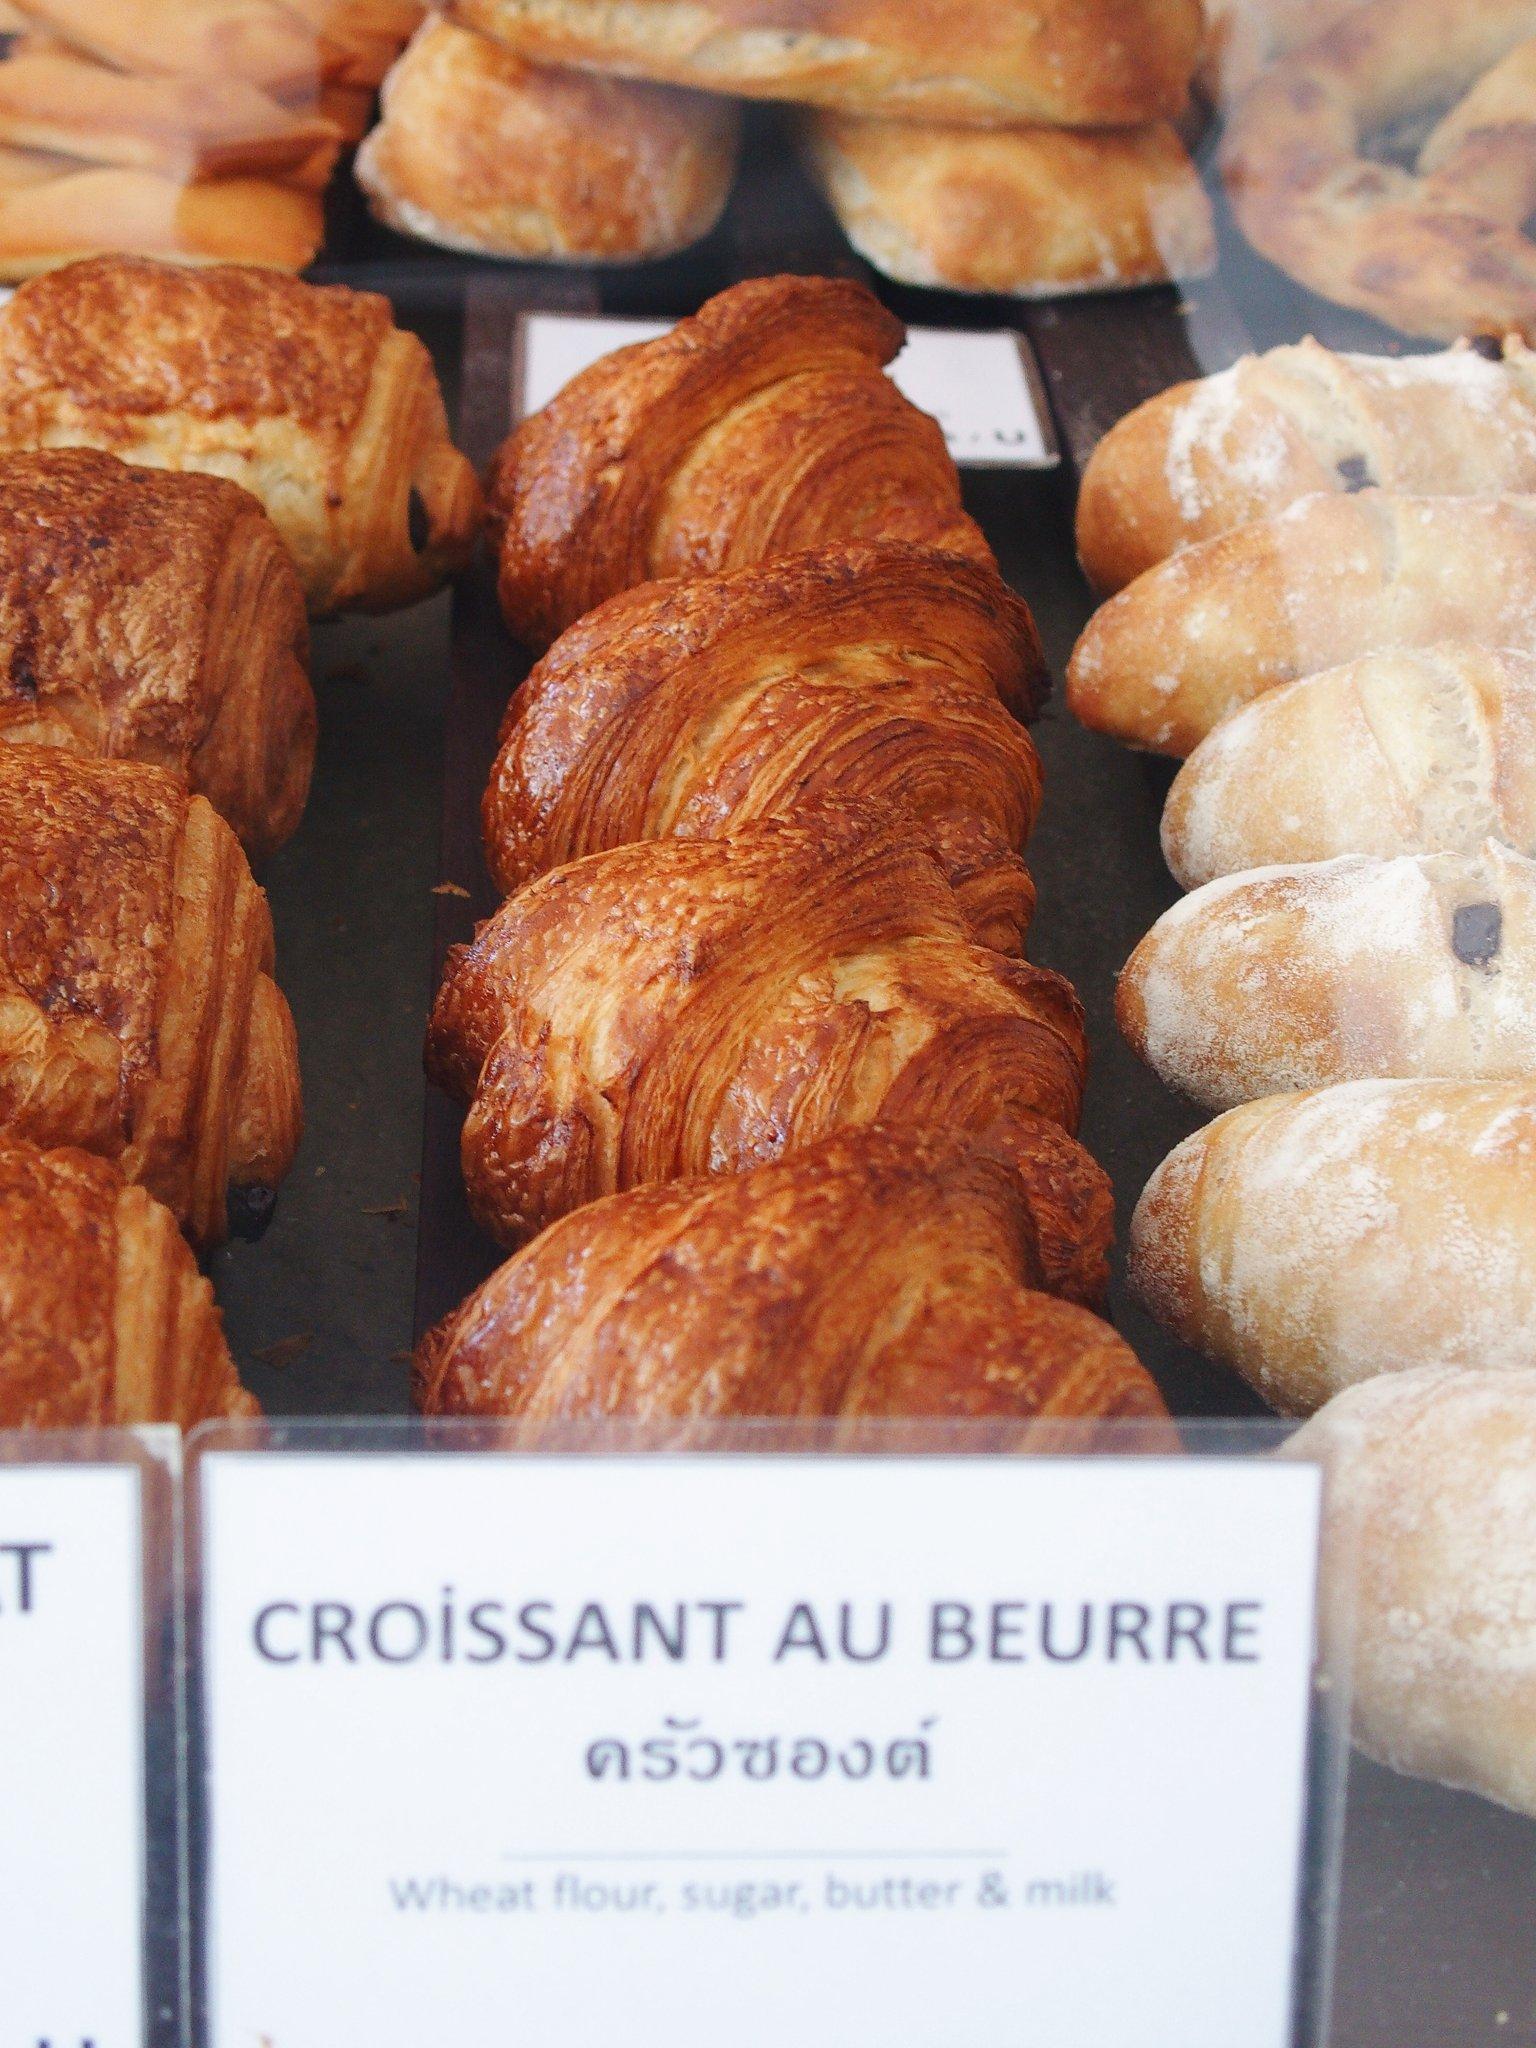 Croissant 6 - แนะนำ 7 ร้านครัวซองต์ กรอบนอกนุ่มใน อร่อยทุกคำที่สัมผัส